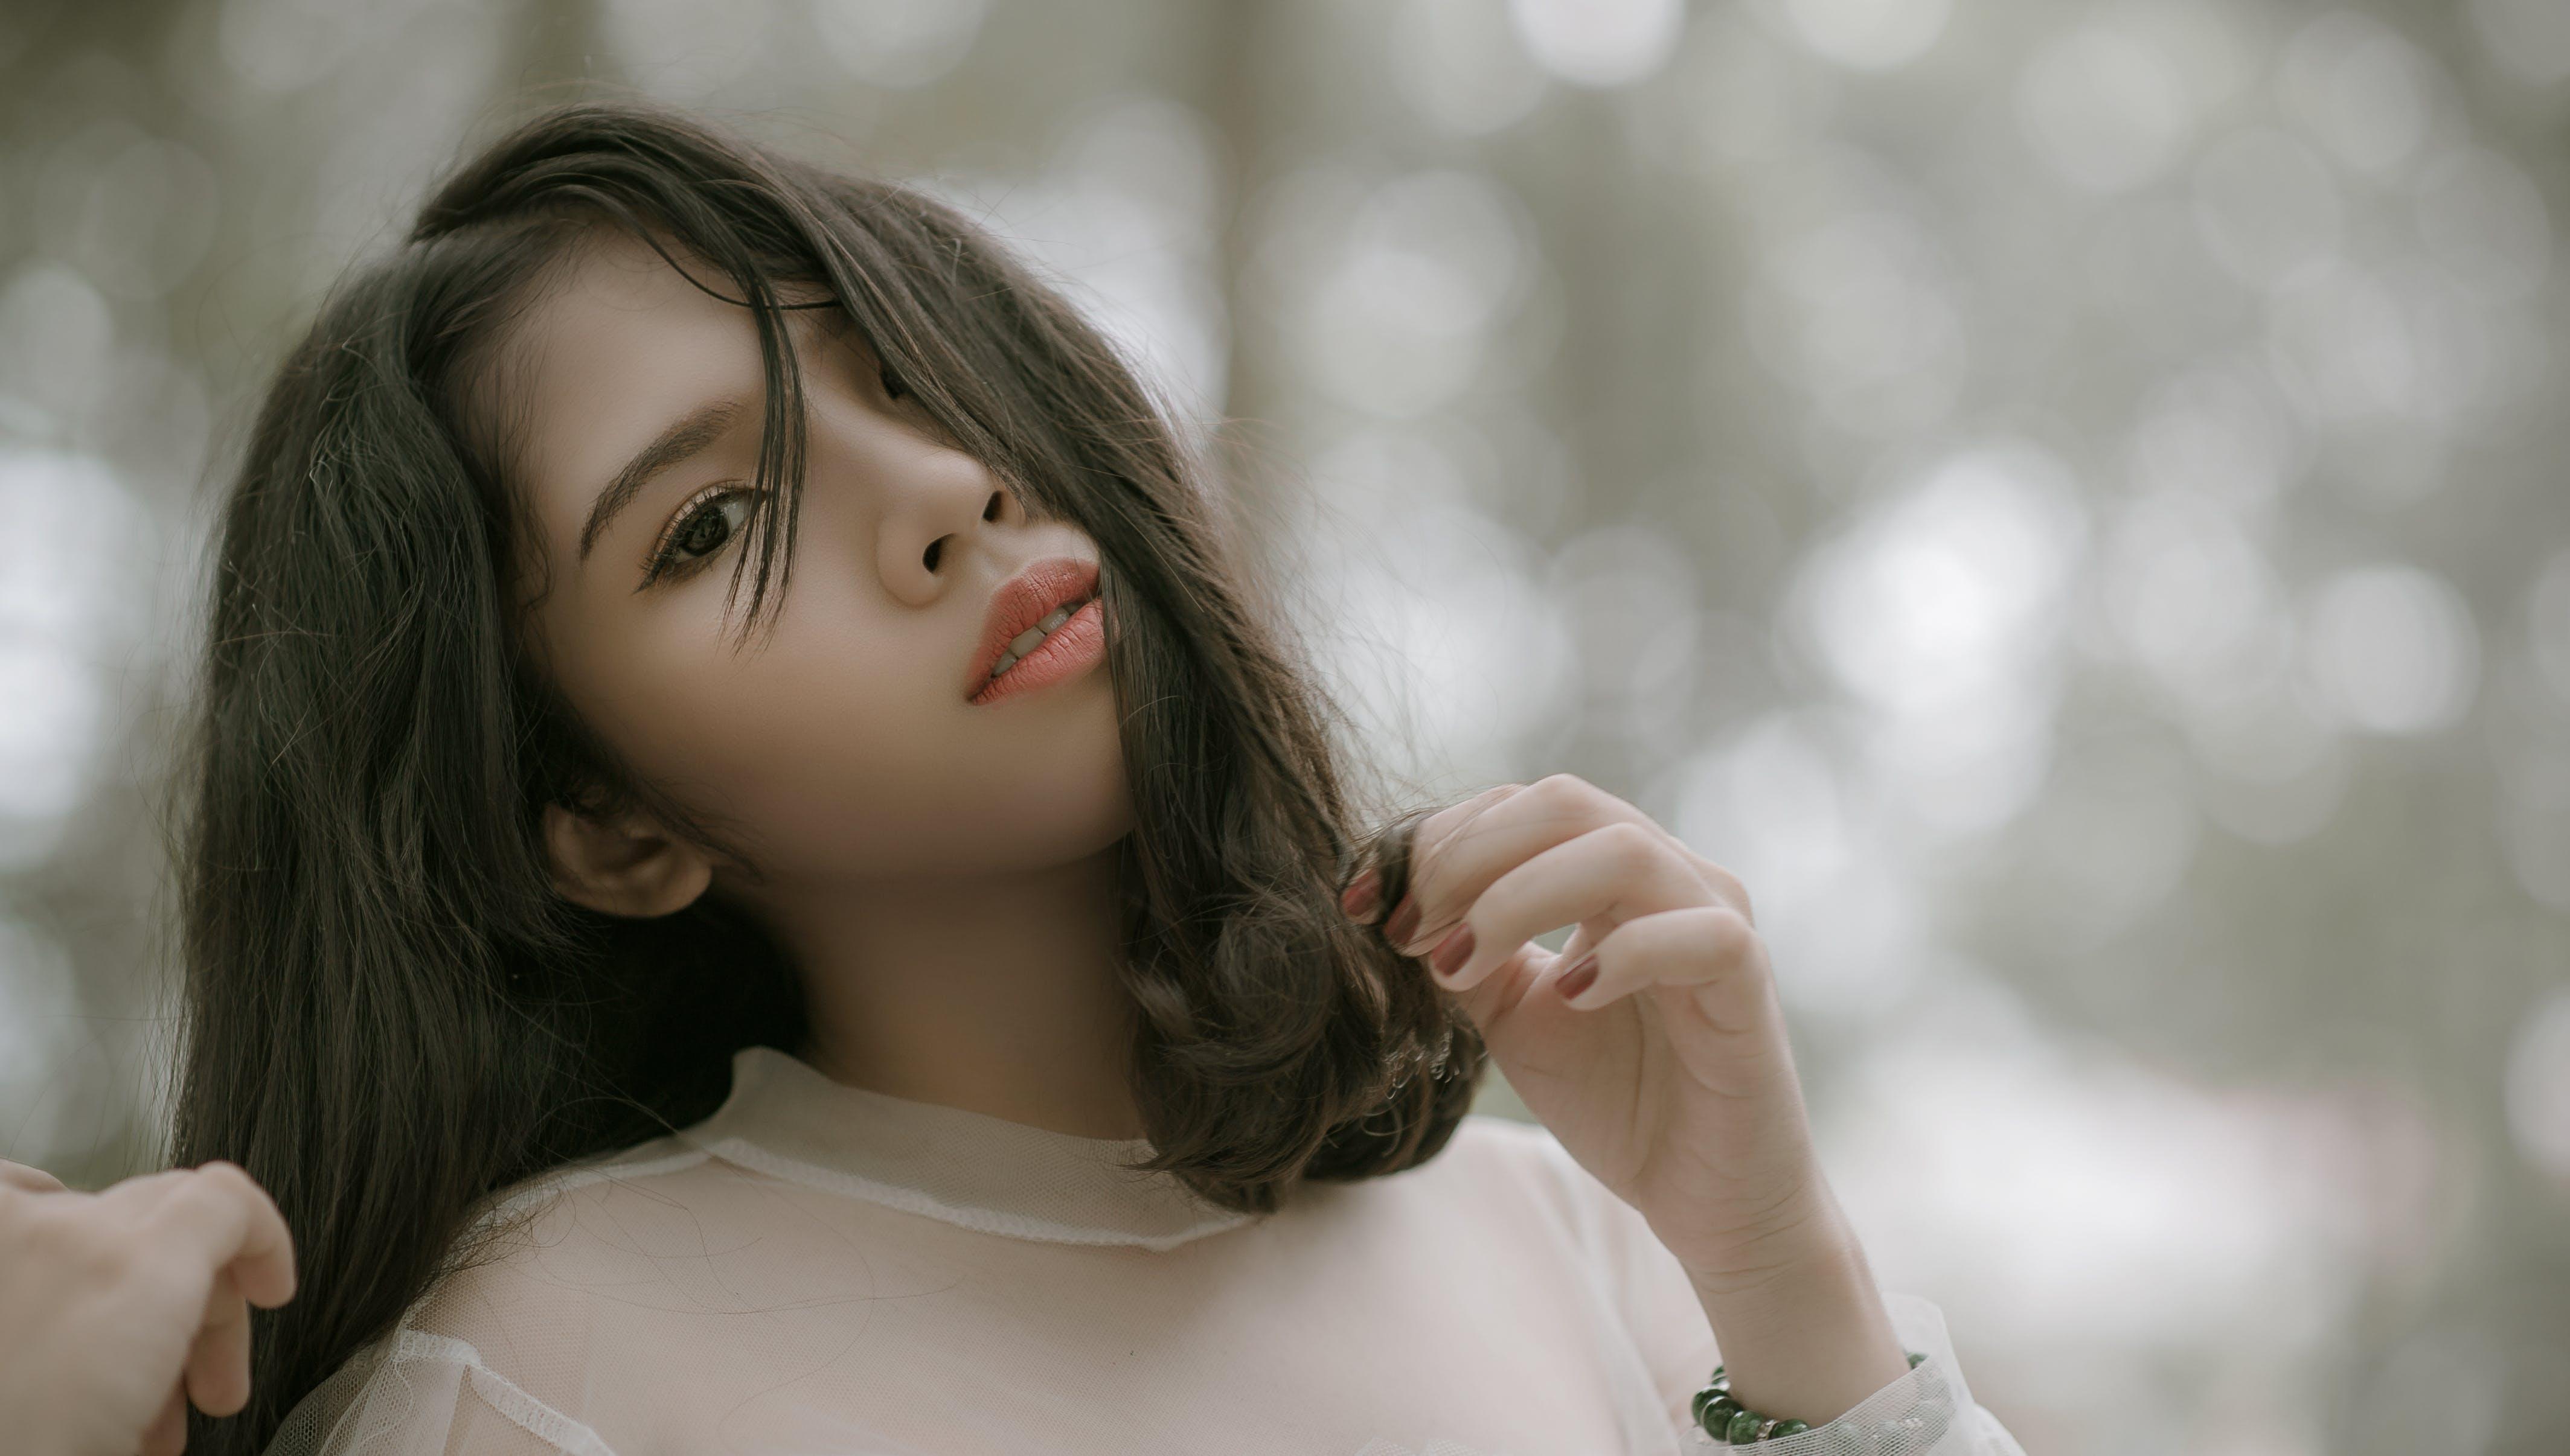 Gratis stockfoto met blurry achtergrond, fashion, fotoshoot, haar